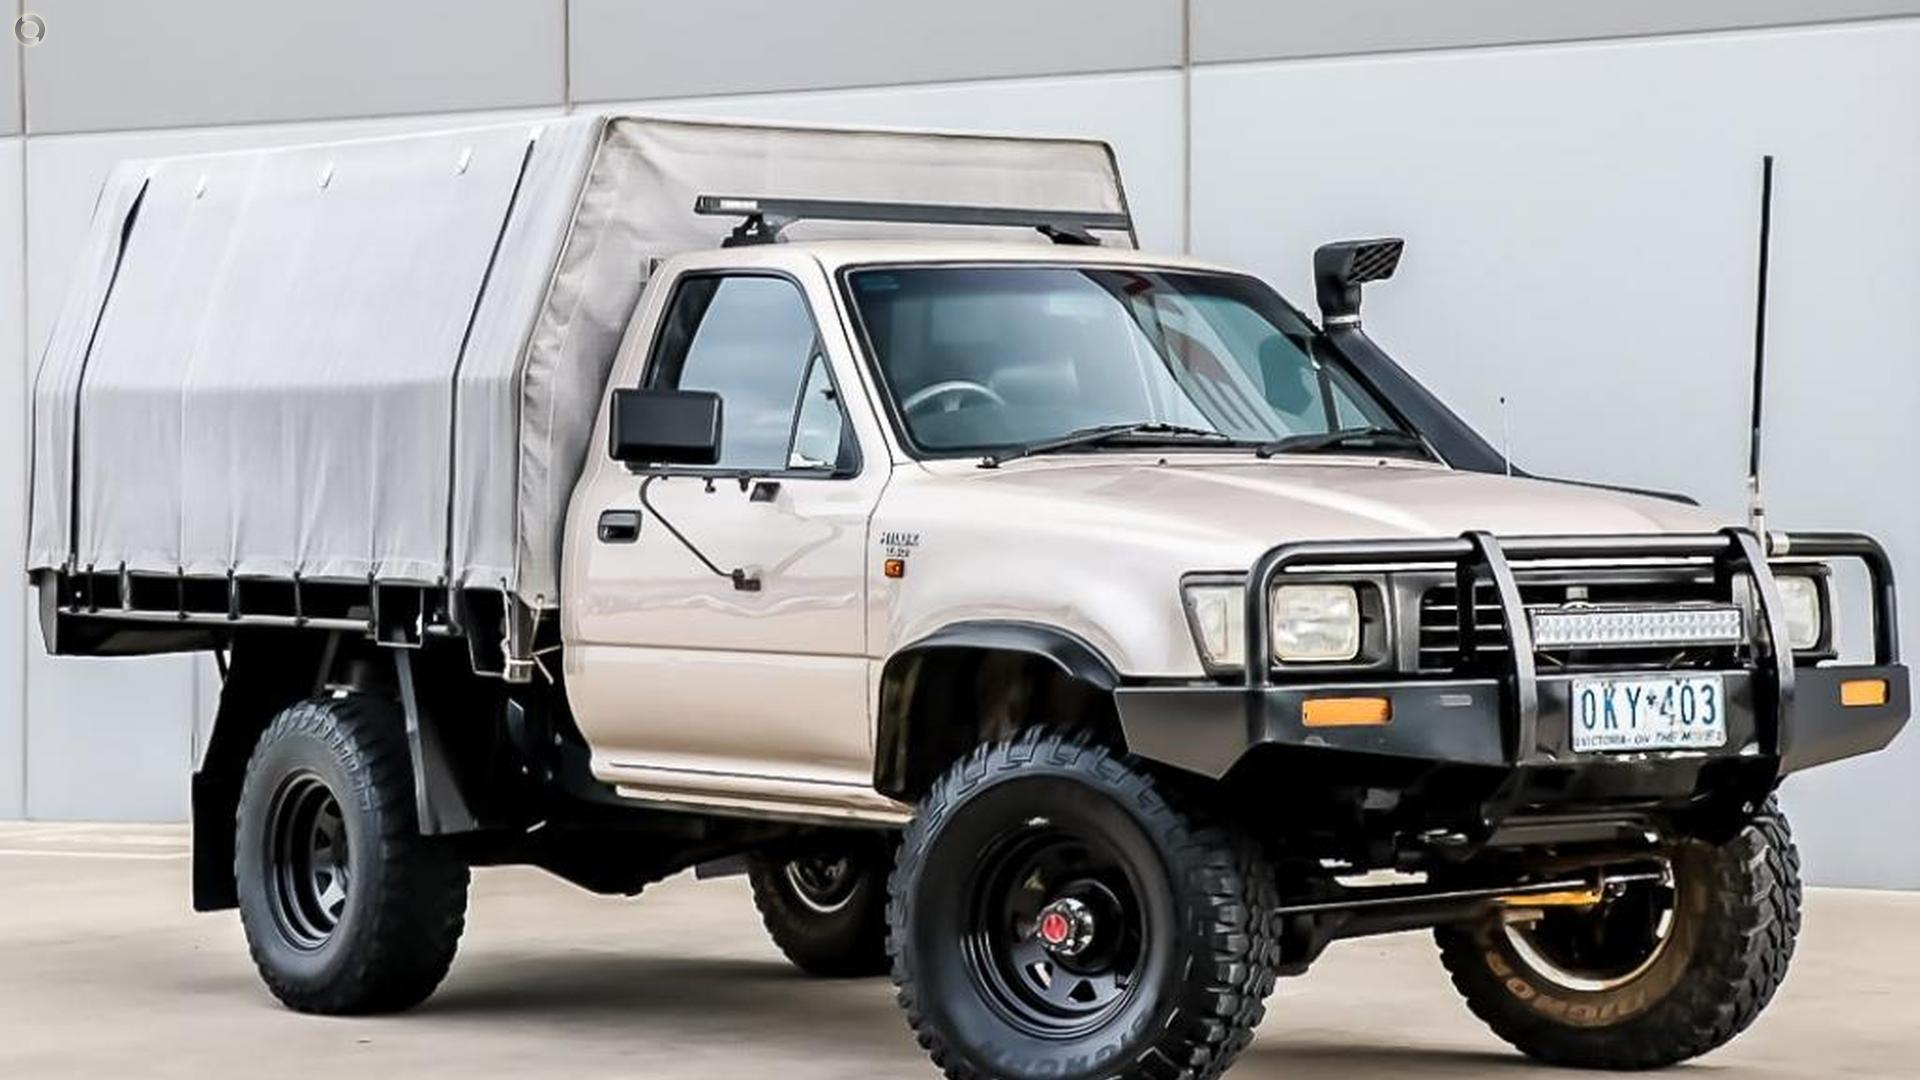 1997 Toyota Hilux LN106R